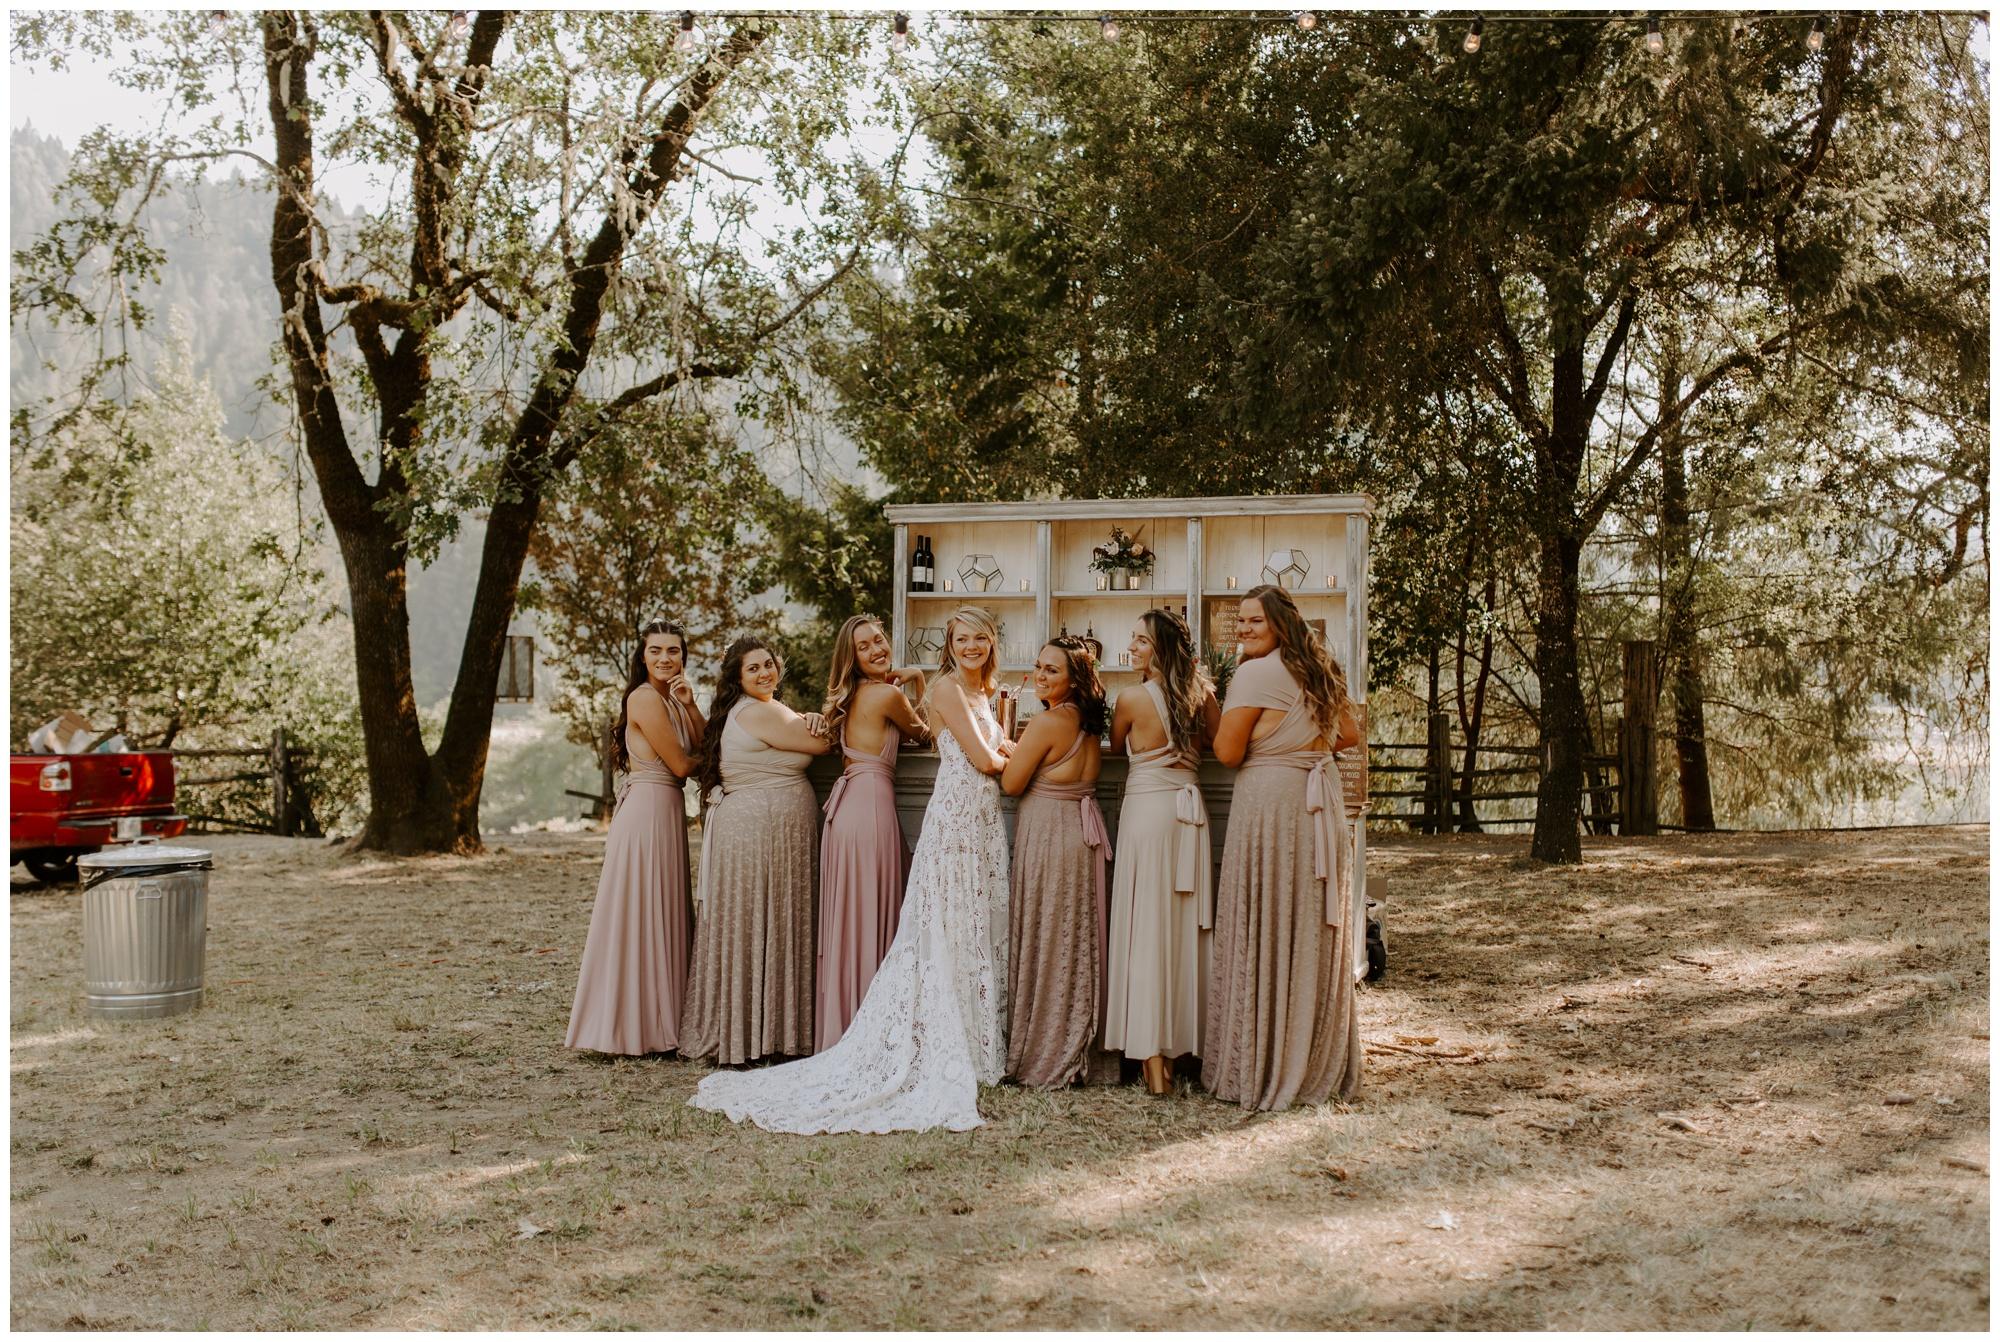 Redwood Festival Wedding Humbolt California - Jessica Heron Images_0024.jpg